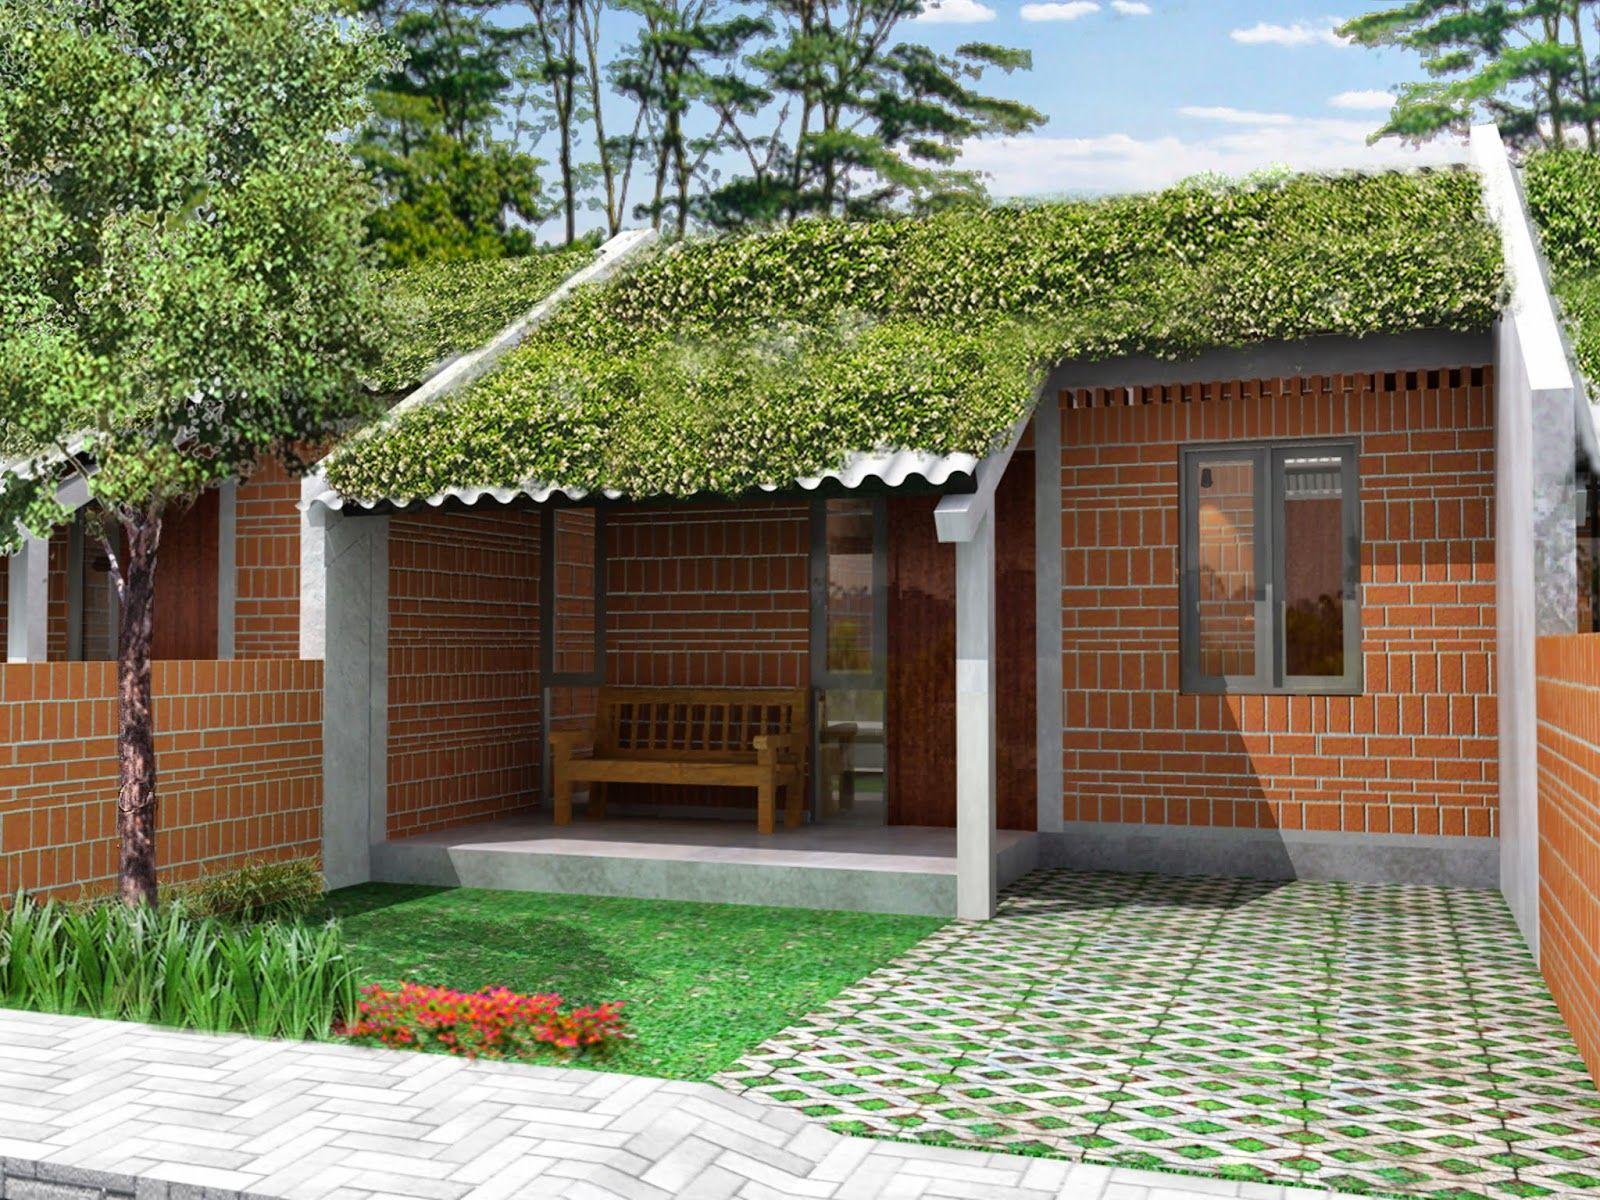 Gambar Desain Rumah Bambu Minimalis Cek Bahan Bangunan